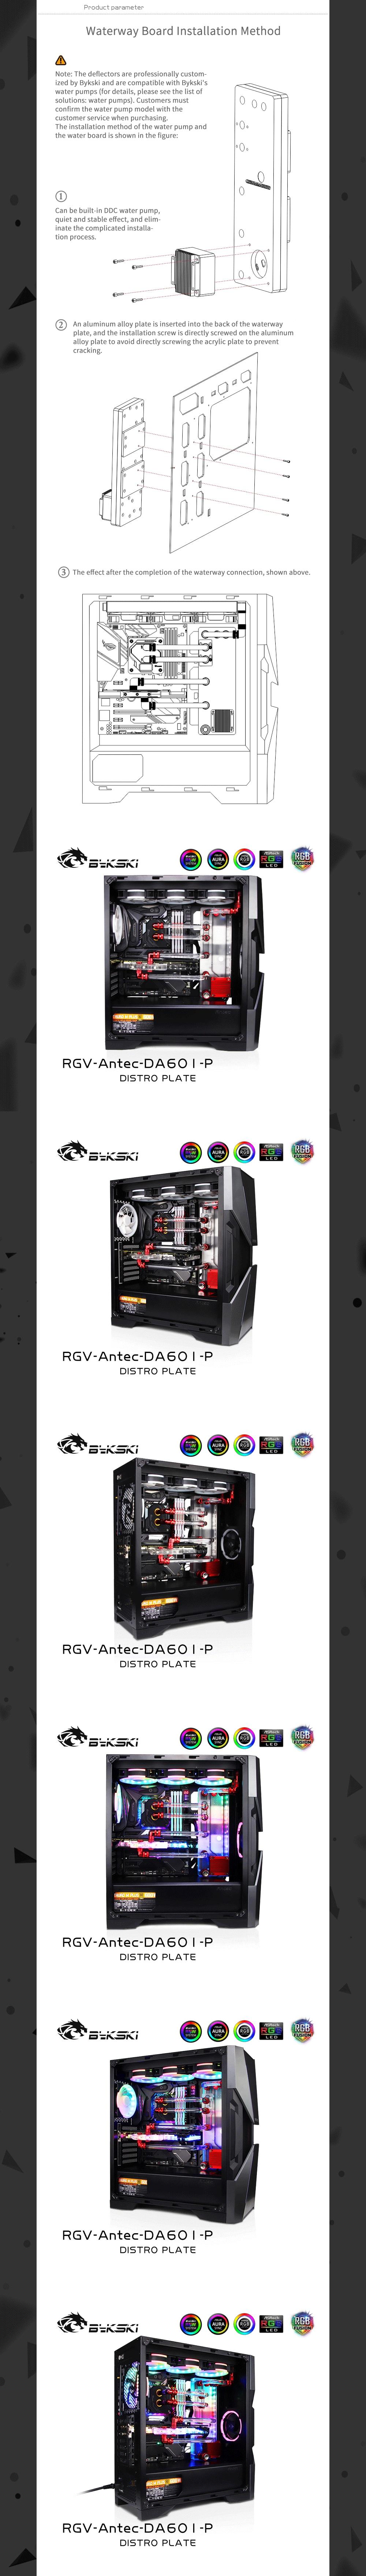 Bykski Waterway Cooling Kit For Antec DA601 Case, 5V ARGB, For Single GPU Building, RGV-Antec-DA601-P